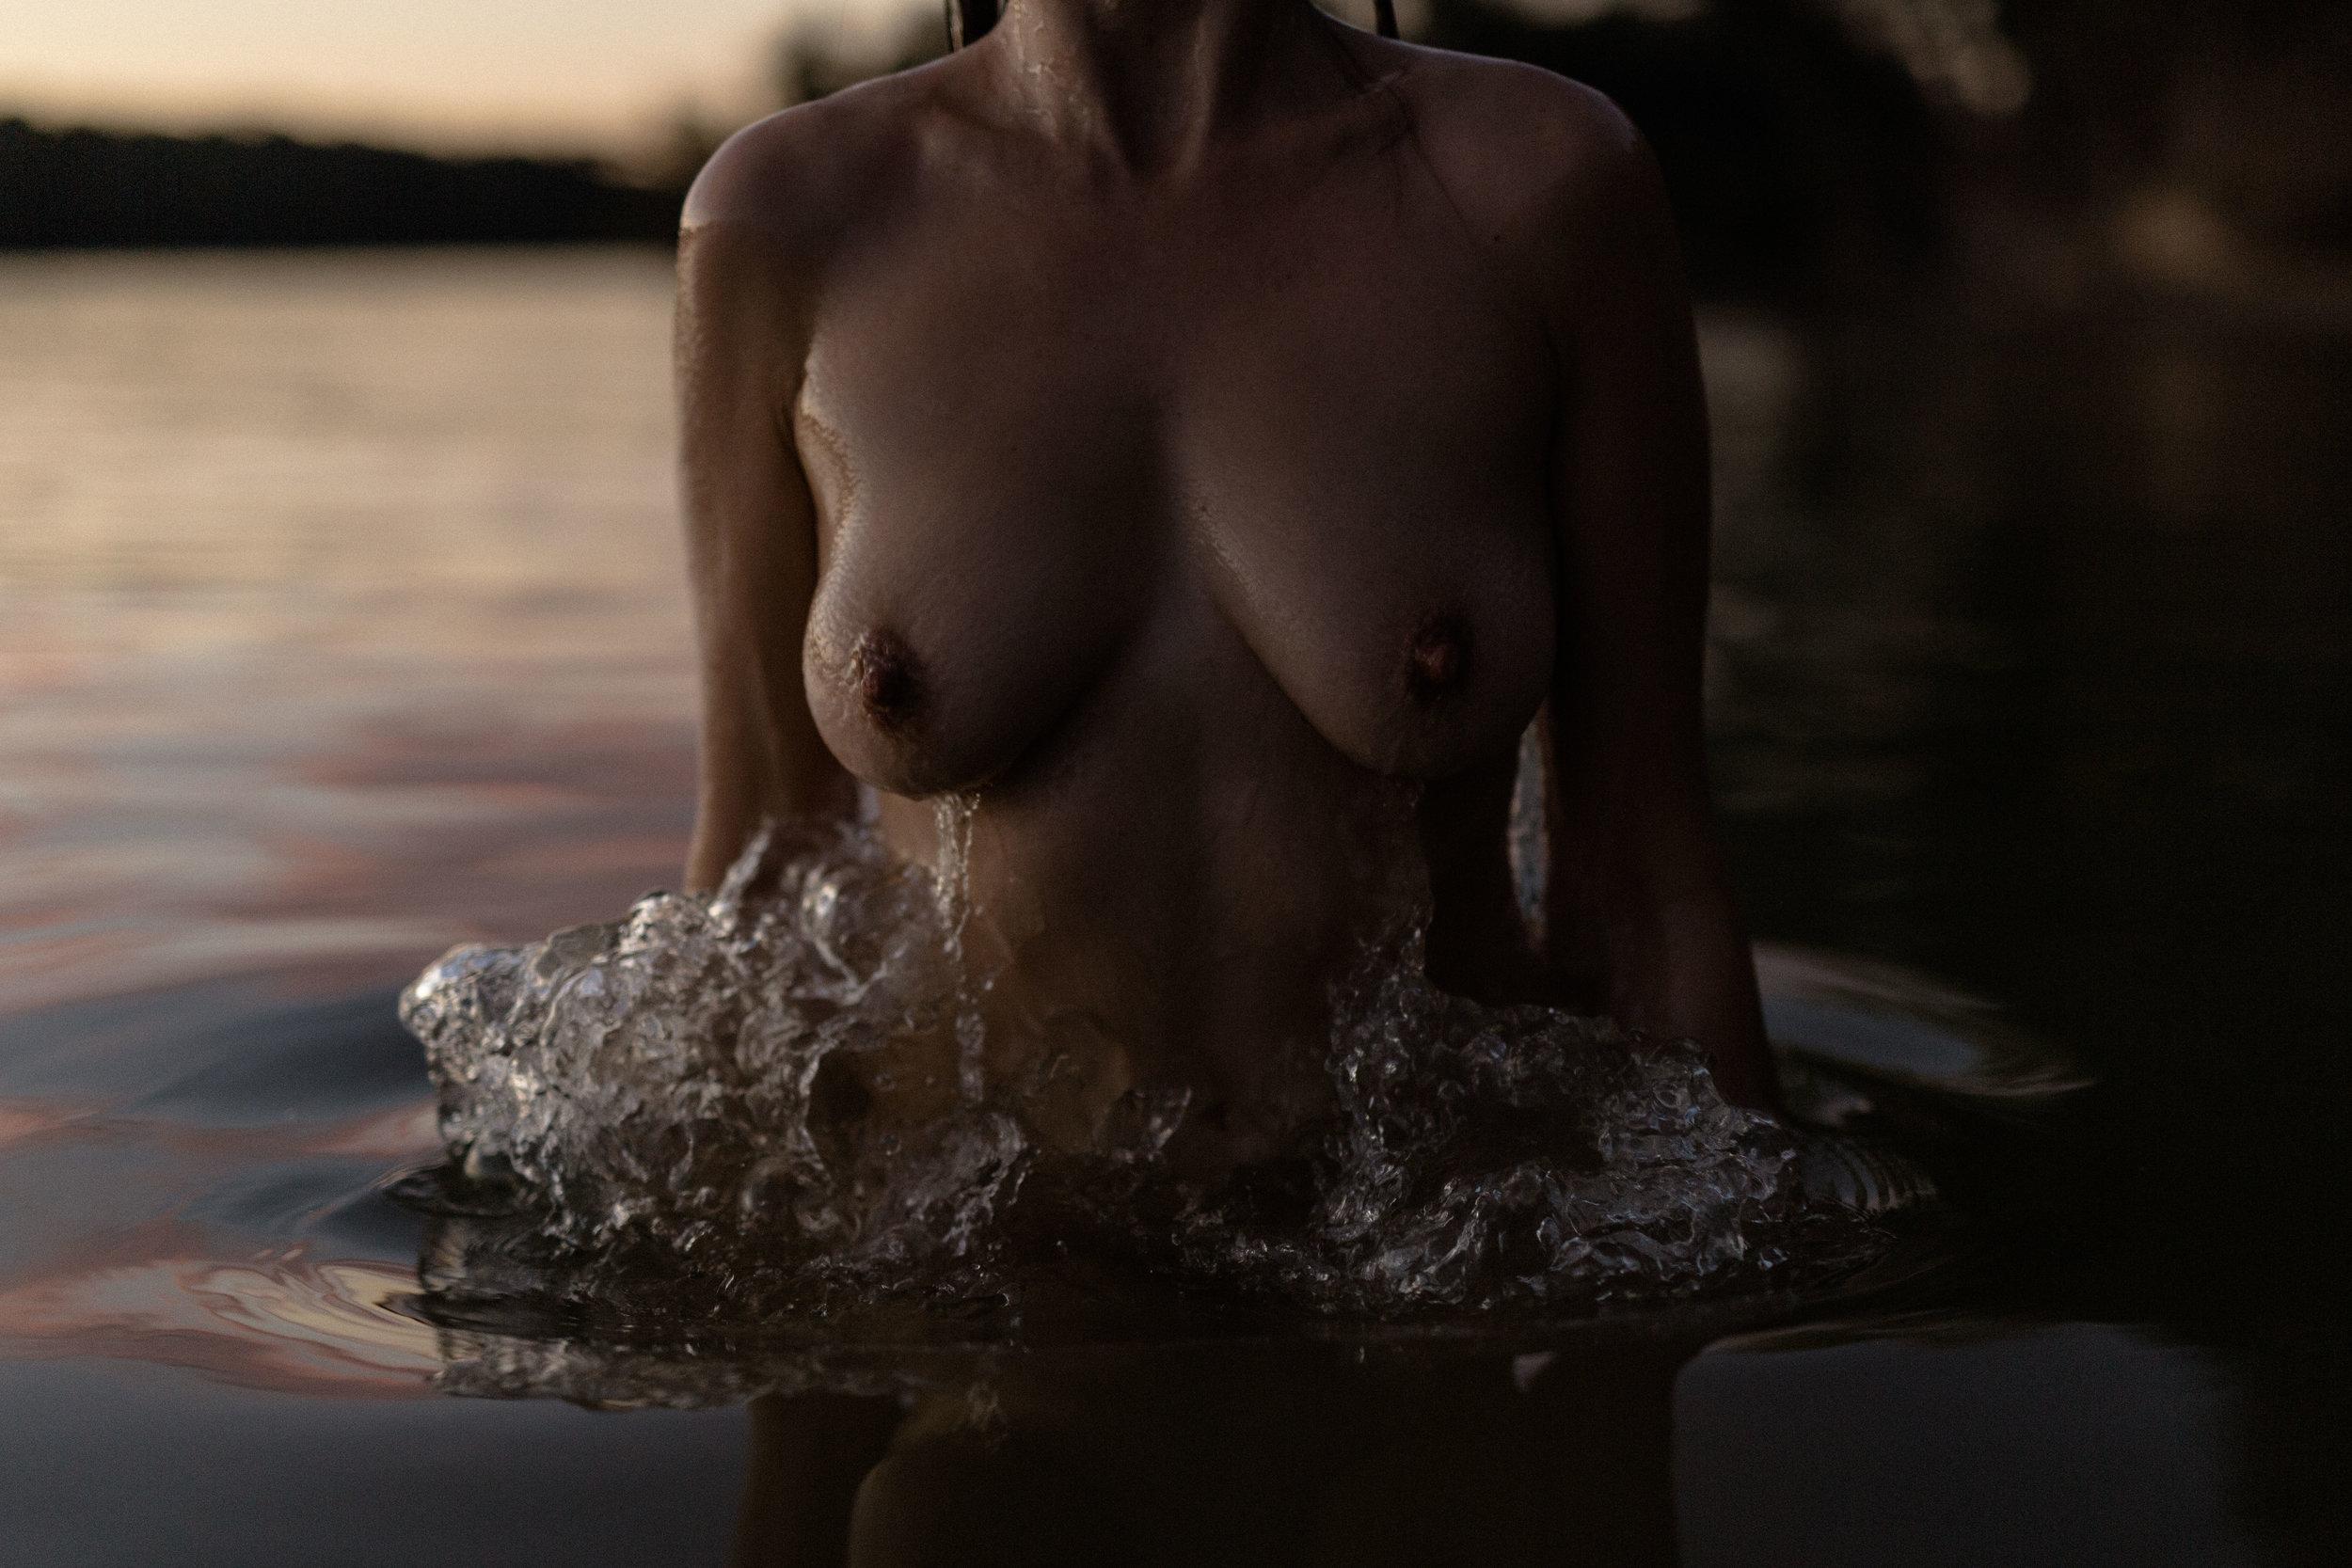 outdoor intimate portrait. artistic nude. boudoir inspiration. underwater nude. underwater boudoir. art model. anoushanou. ohio boudoir photographer. sarah rose photography. i am sarah rose.